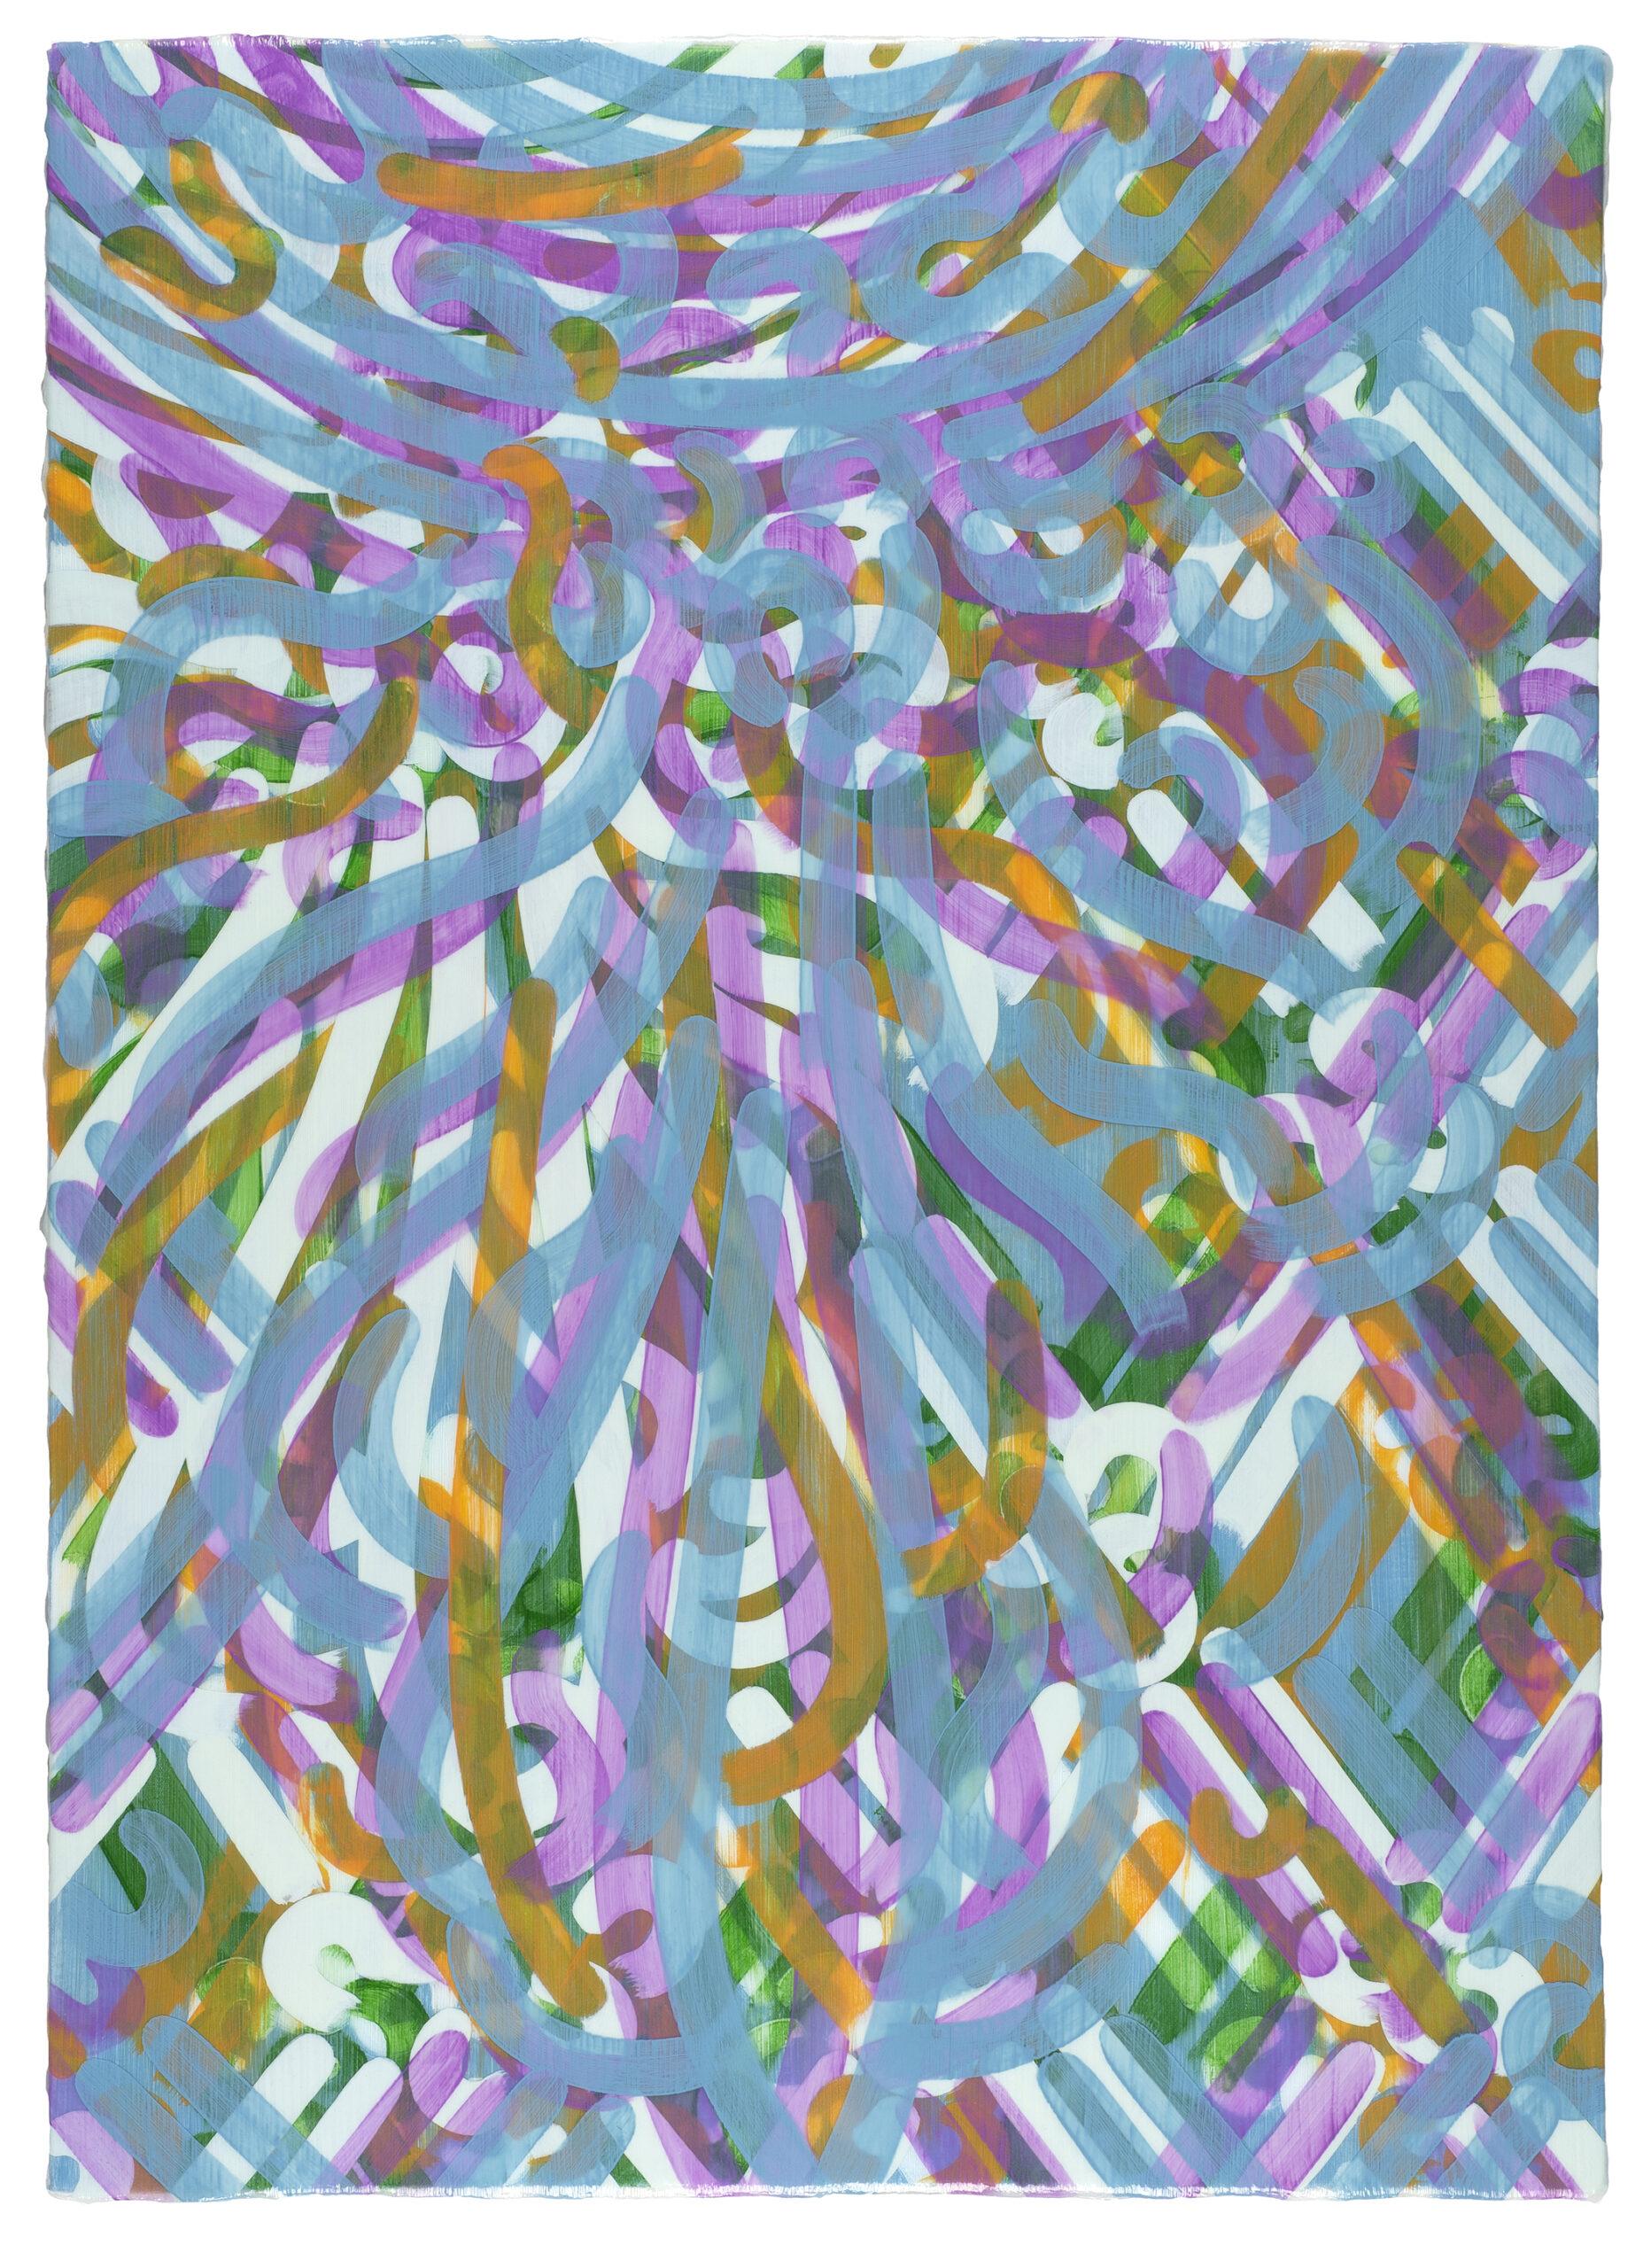 Blueprint I 2020 acrylic on canvas on board 36x26in